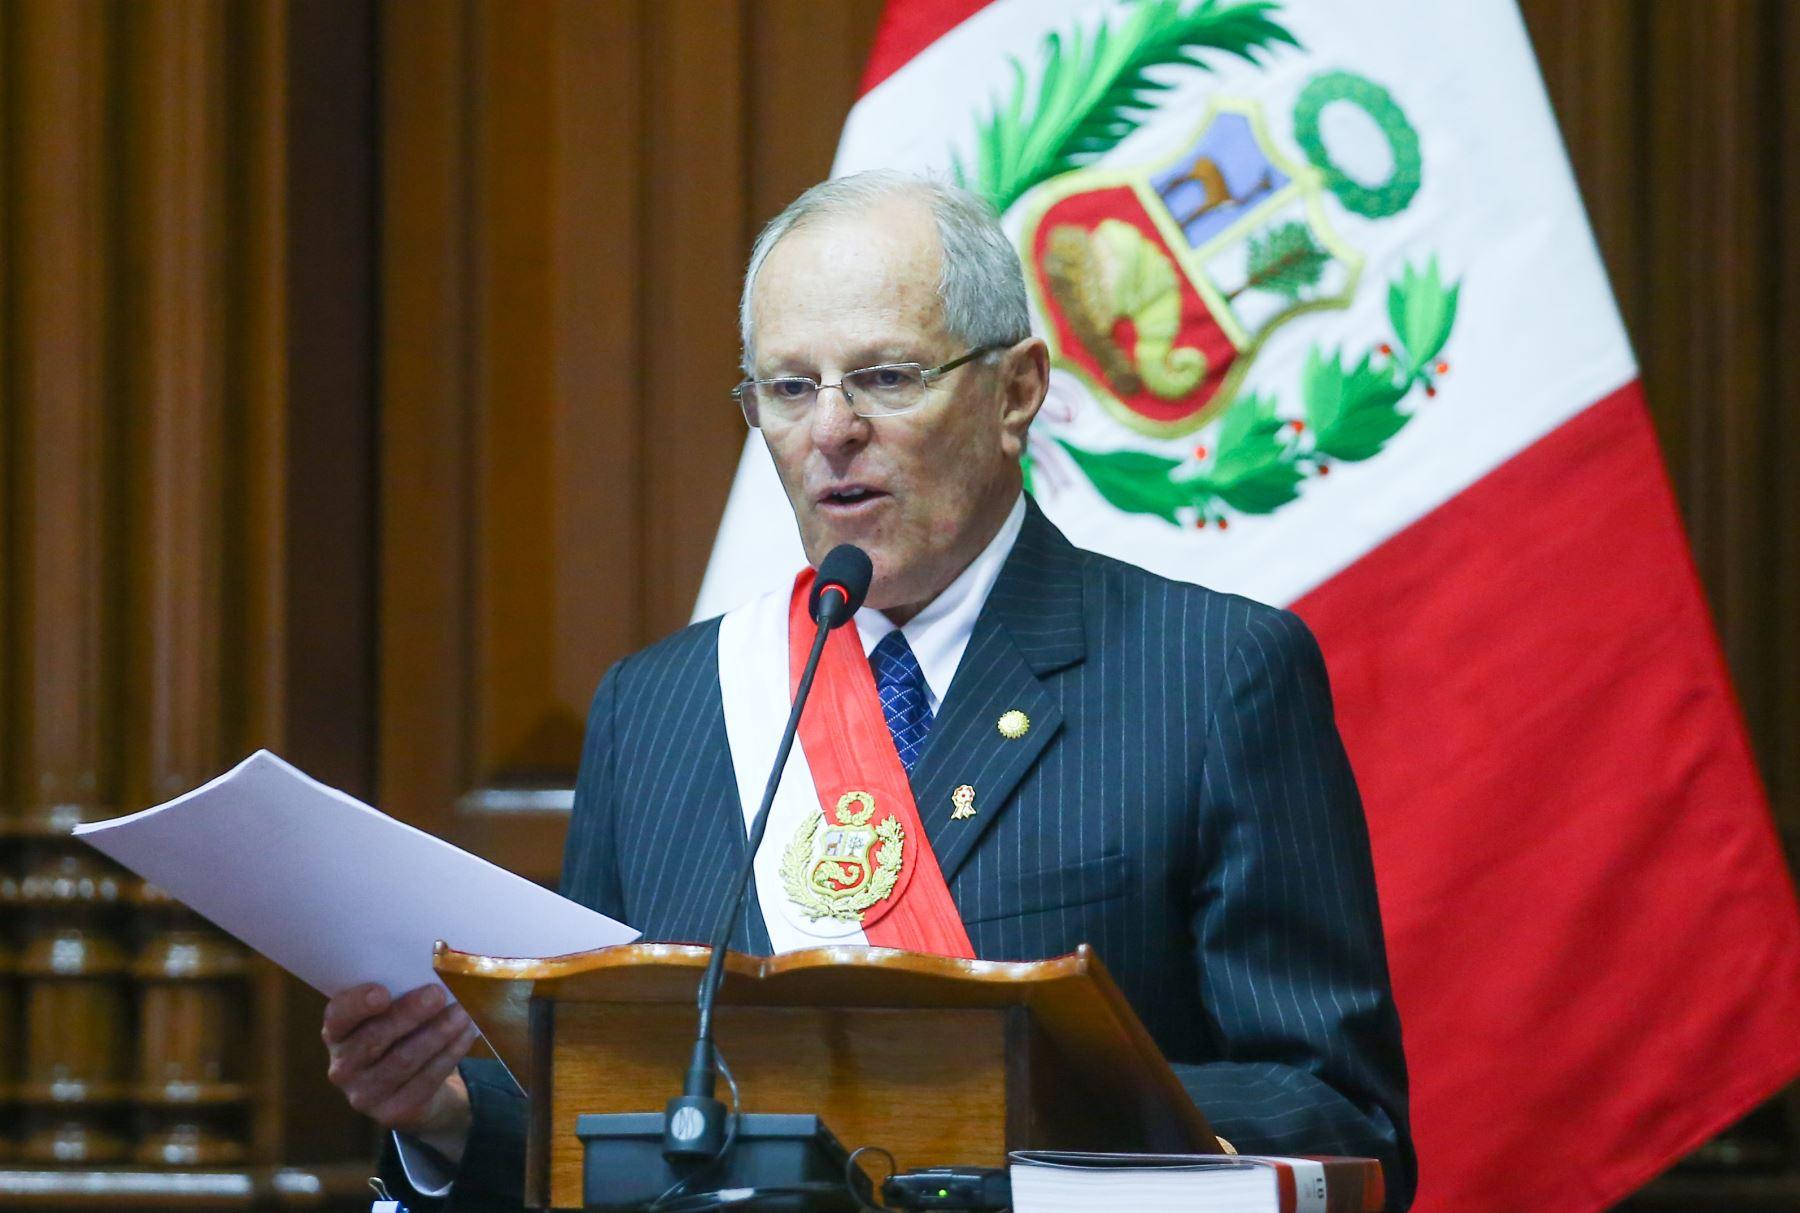 Pedro-Pablo-Mensaje-Presidencial